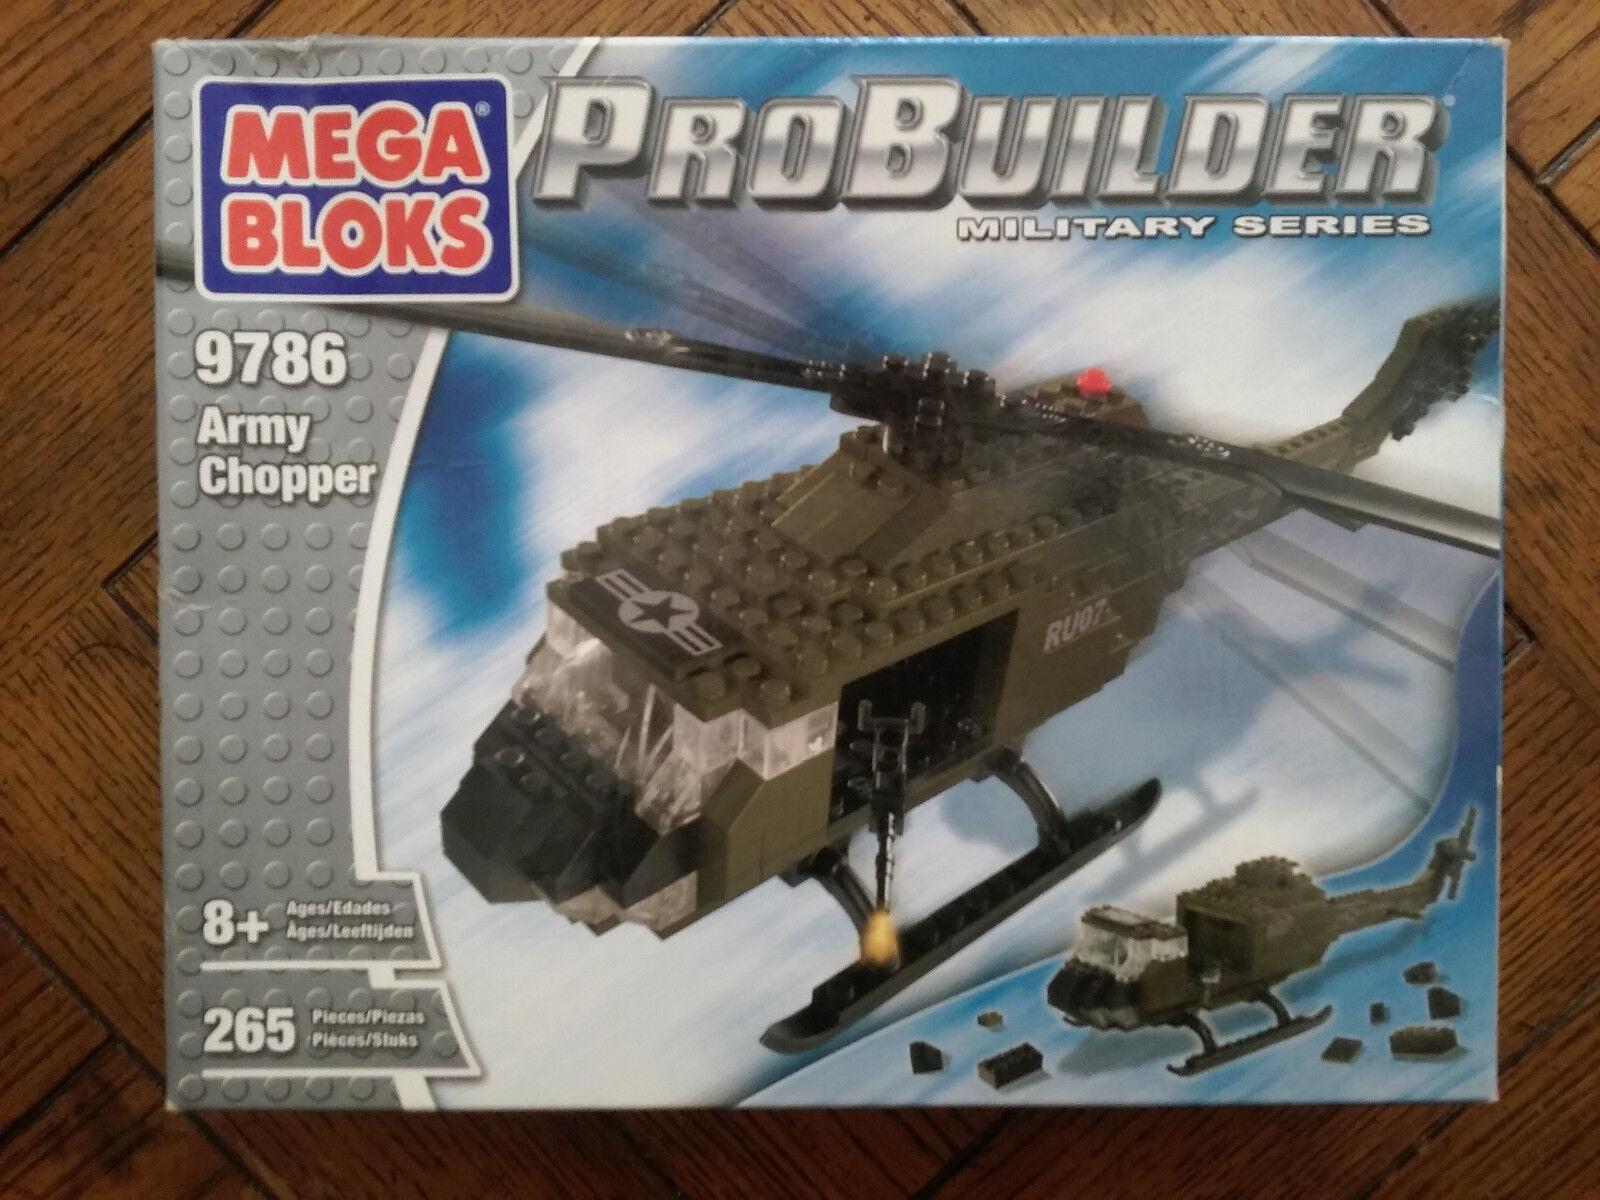 Mega Bloks ProBuilder Army Chopper (Huey Helicopter) - Brand New Unopened